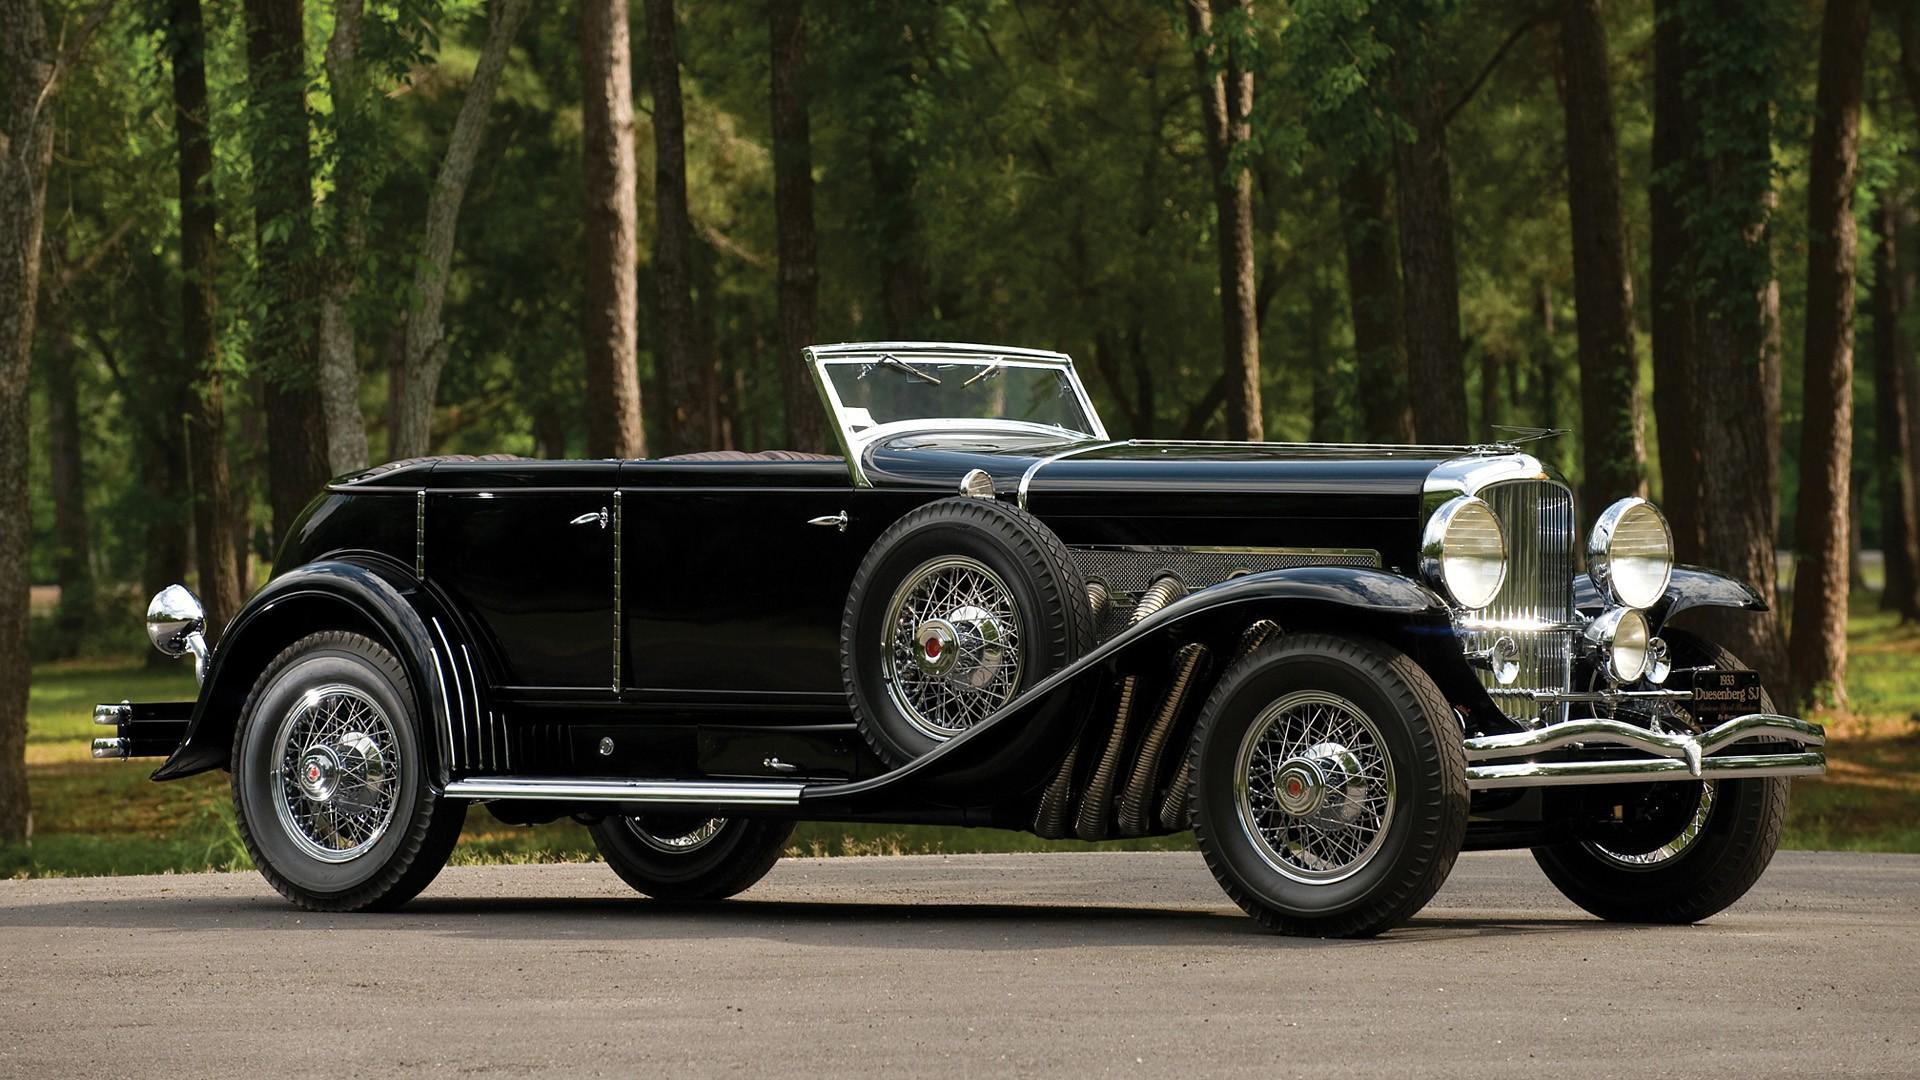 duesenberg vintage car wallpapers - photo #2